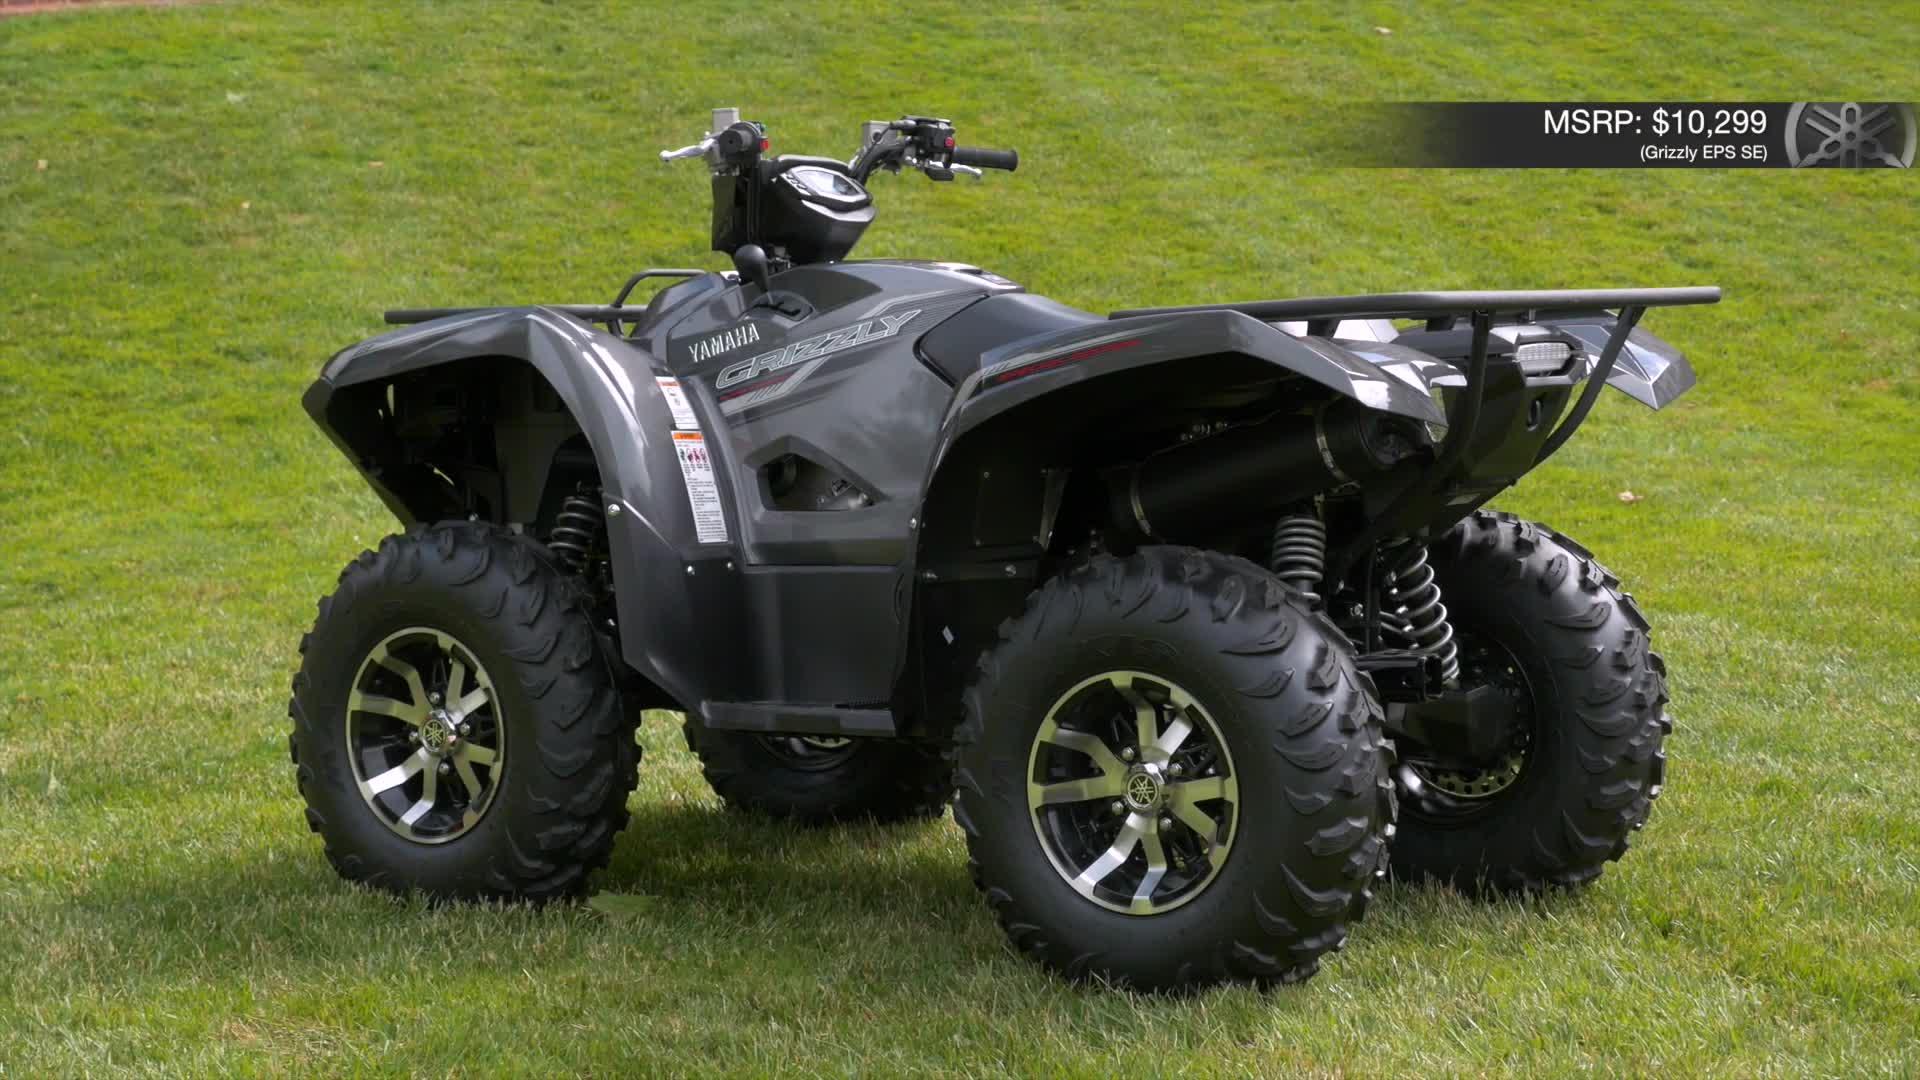 2016 Yamaha Grizzly 700 EPS 4x4 Walkaround [Video]